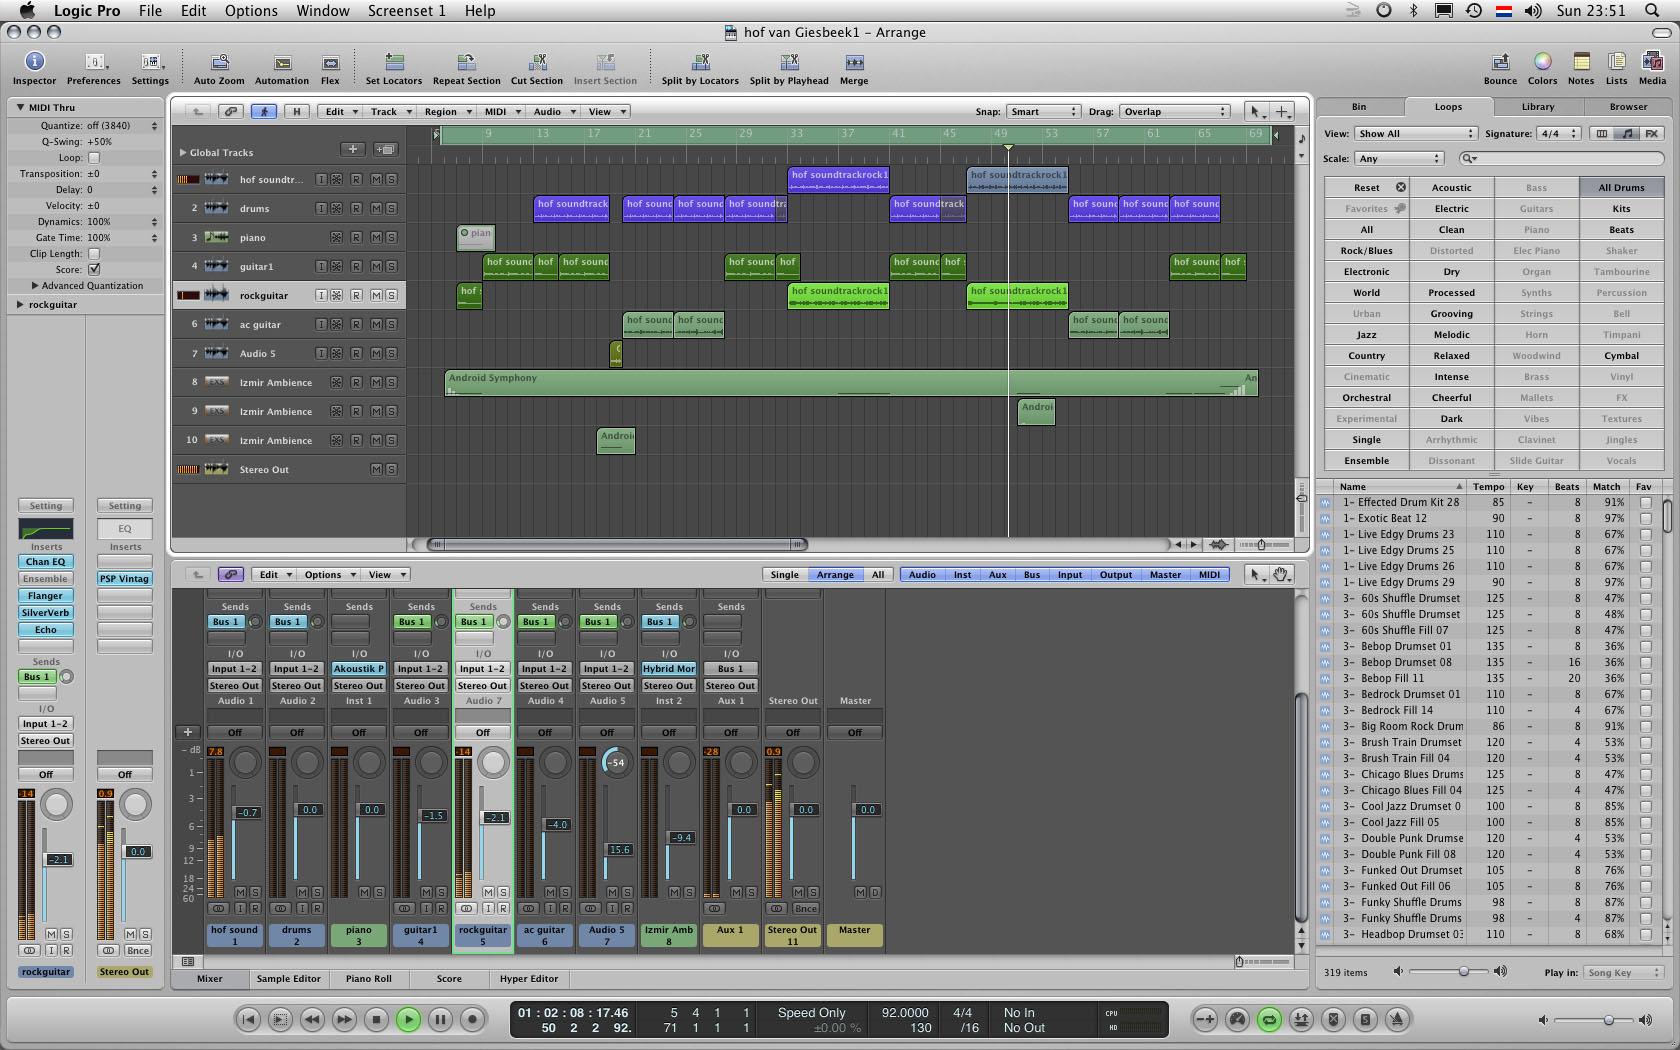 Logic Pro 9 Full Download